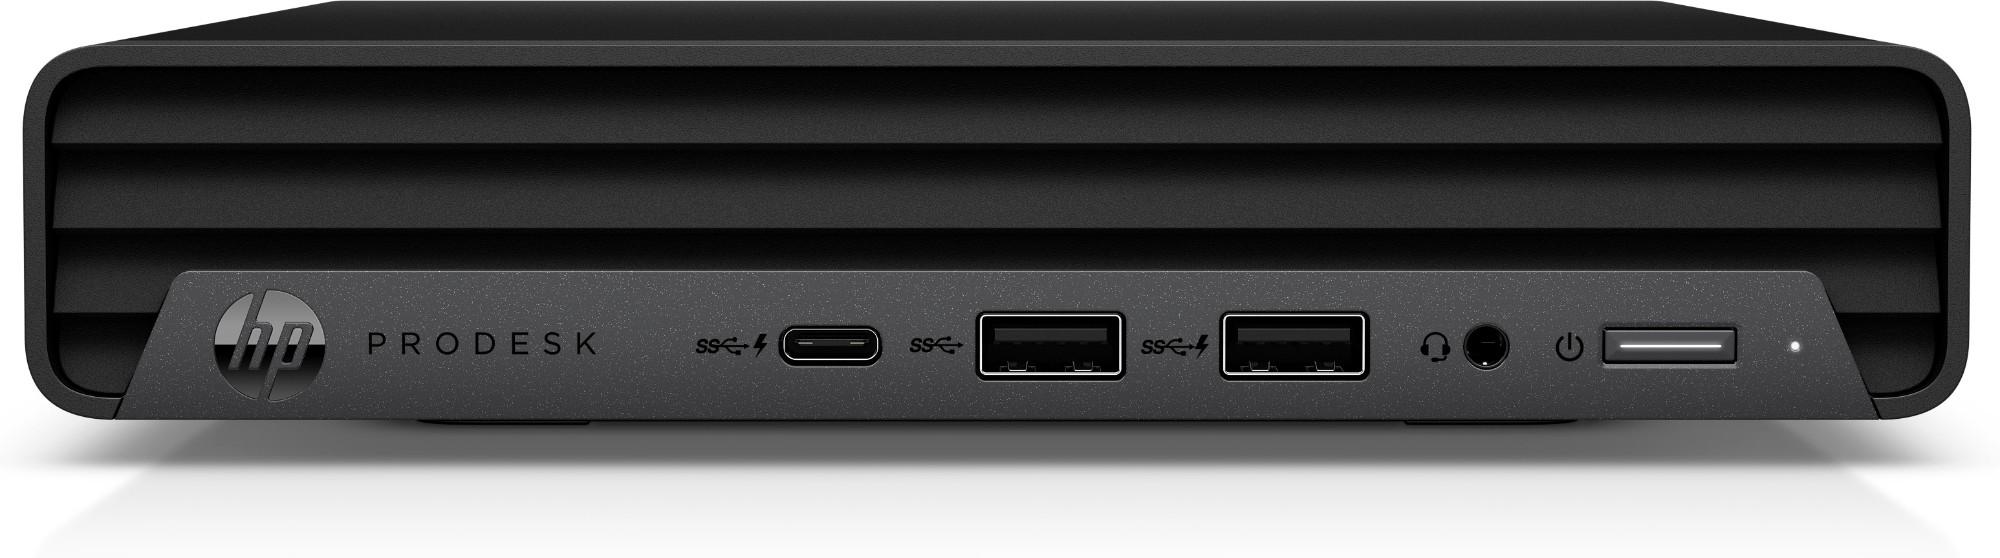 HP ProDesk 600 G6 Intel® Core™ i5 de 10ma Generación i5-10500 8 GB DDR4-SDRAM 256 GB SSD mini PC Negro Windows 10 Pro